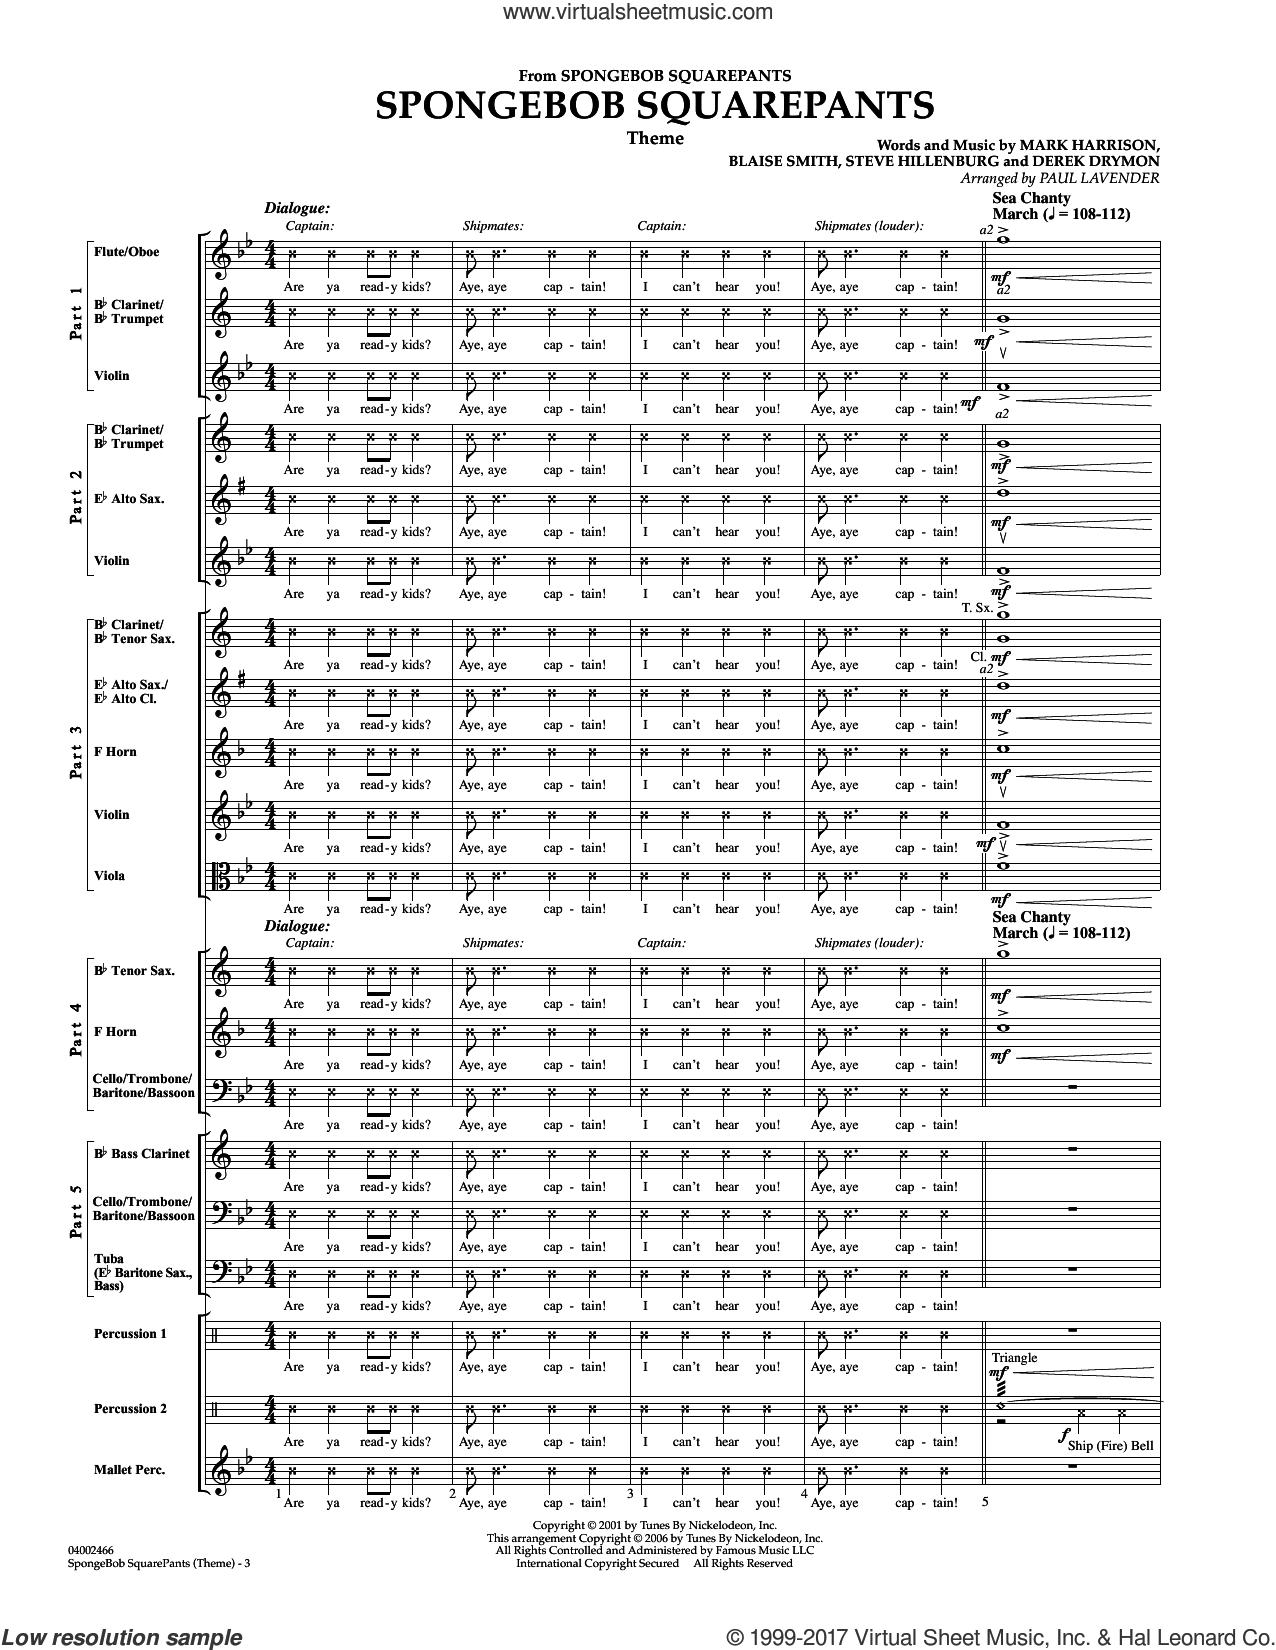 Spongebob Squarepants  (Flex-Band) (COMPLETE) sheet music for concert band by Paul Lavender, Blaise Smith, Derek Drym, Mark Harrison and Steve Hillenburg, intermediate skill level